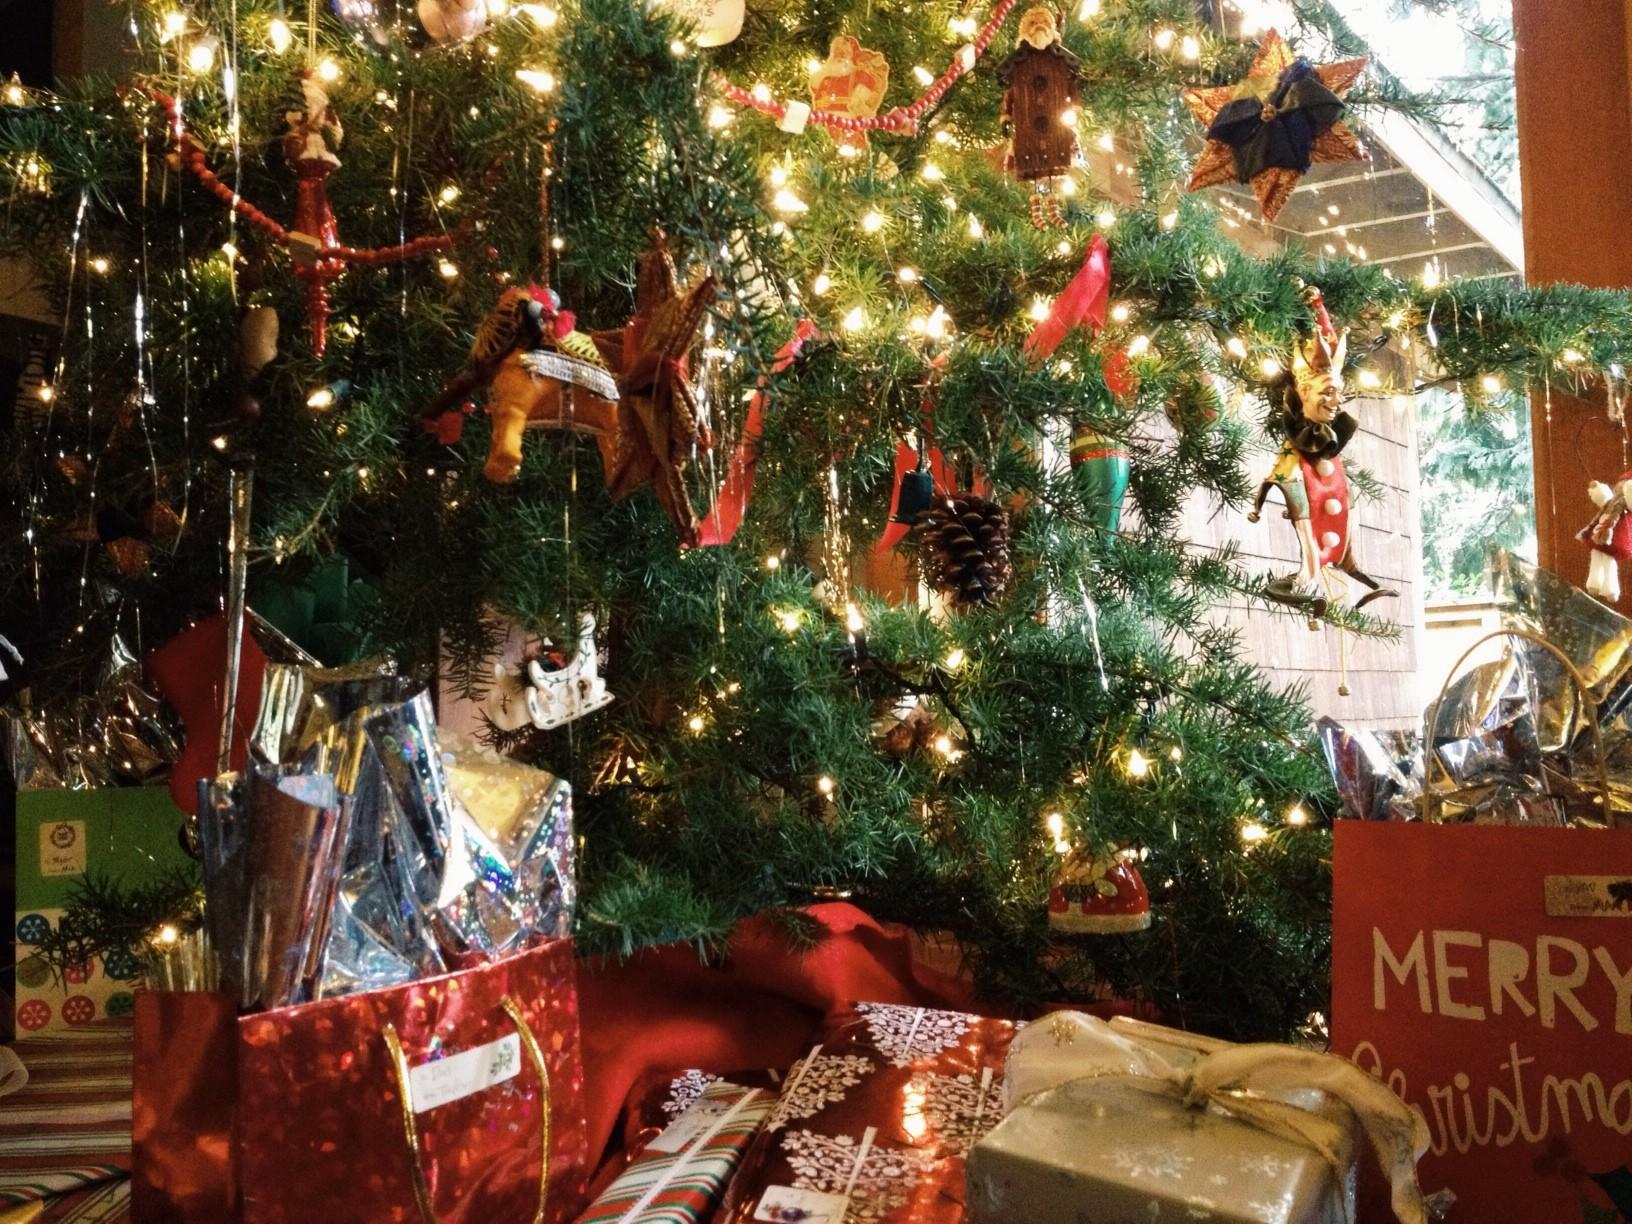 northwest christmas tree - Christmas Tree History